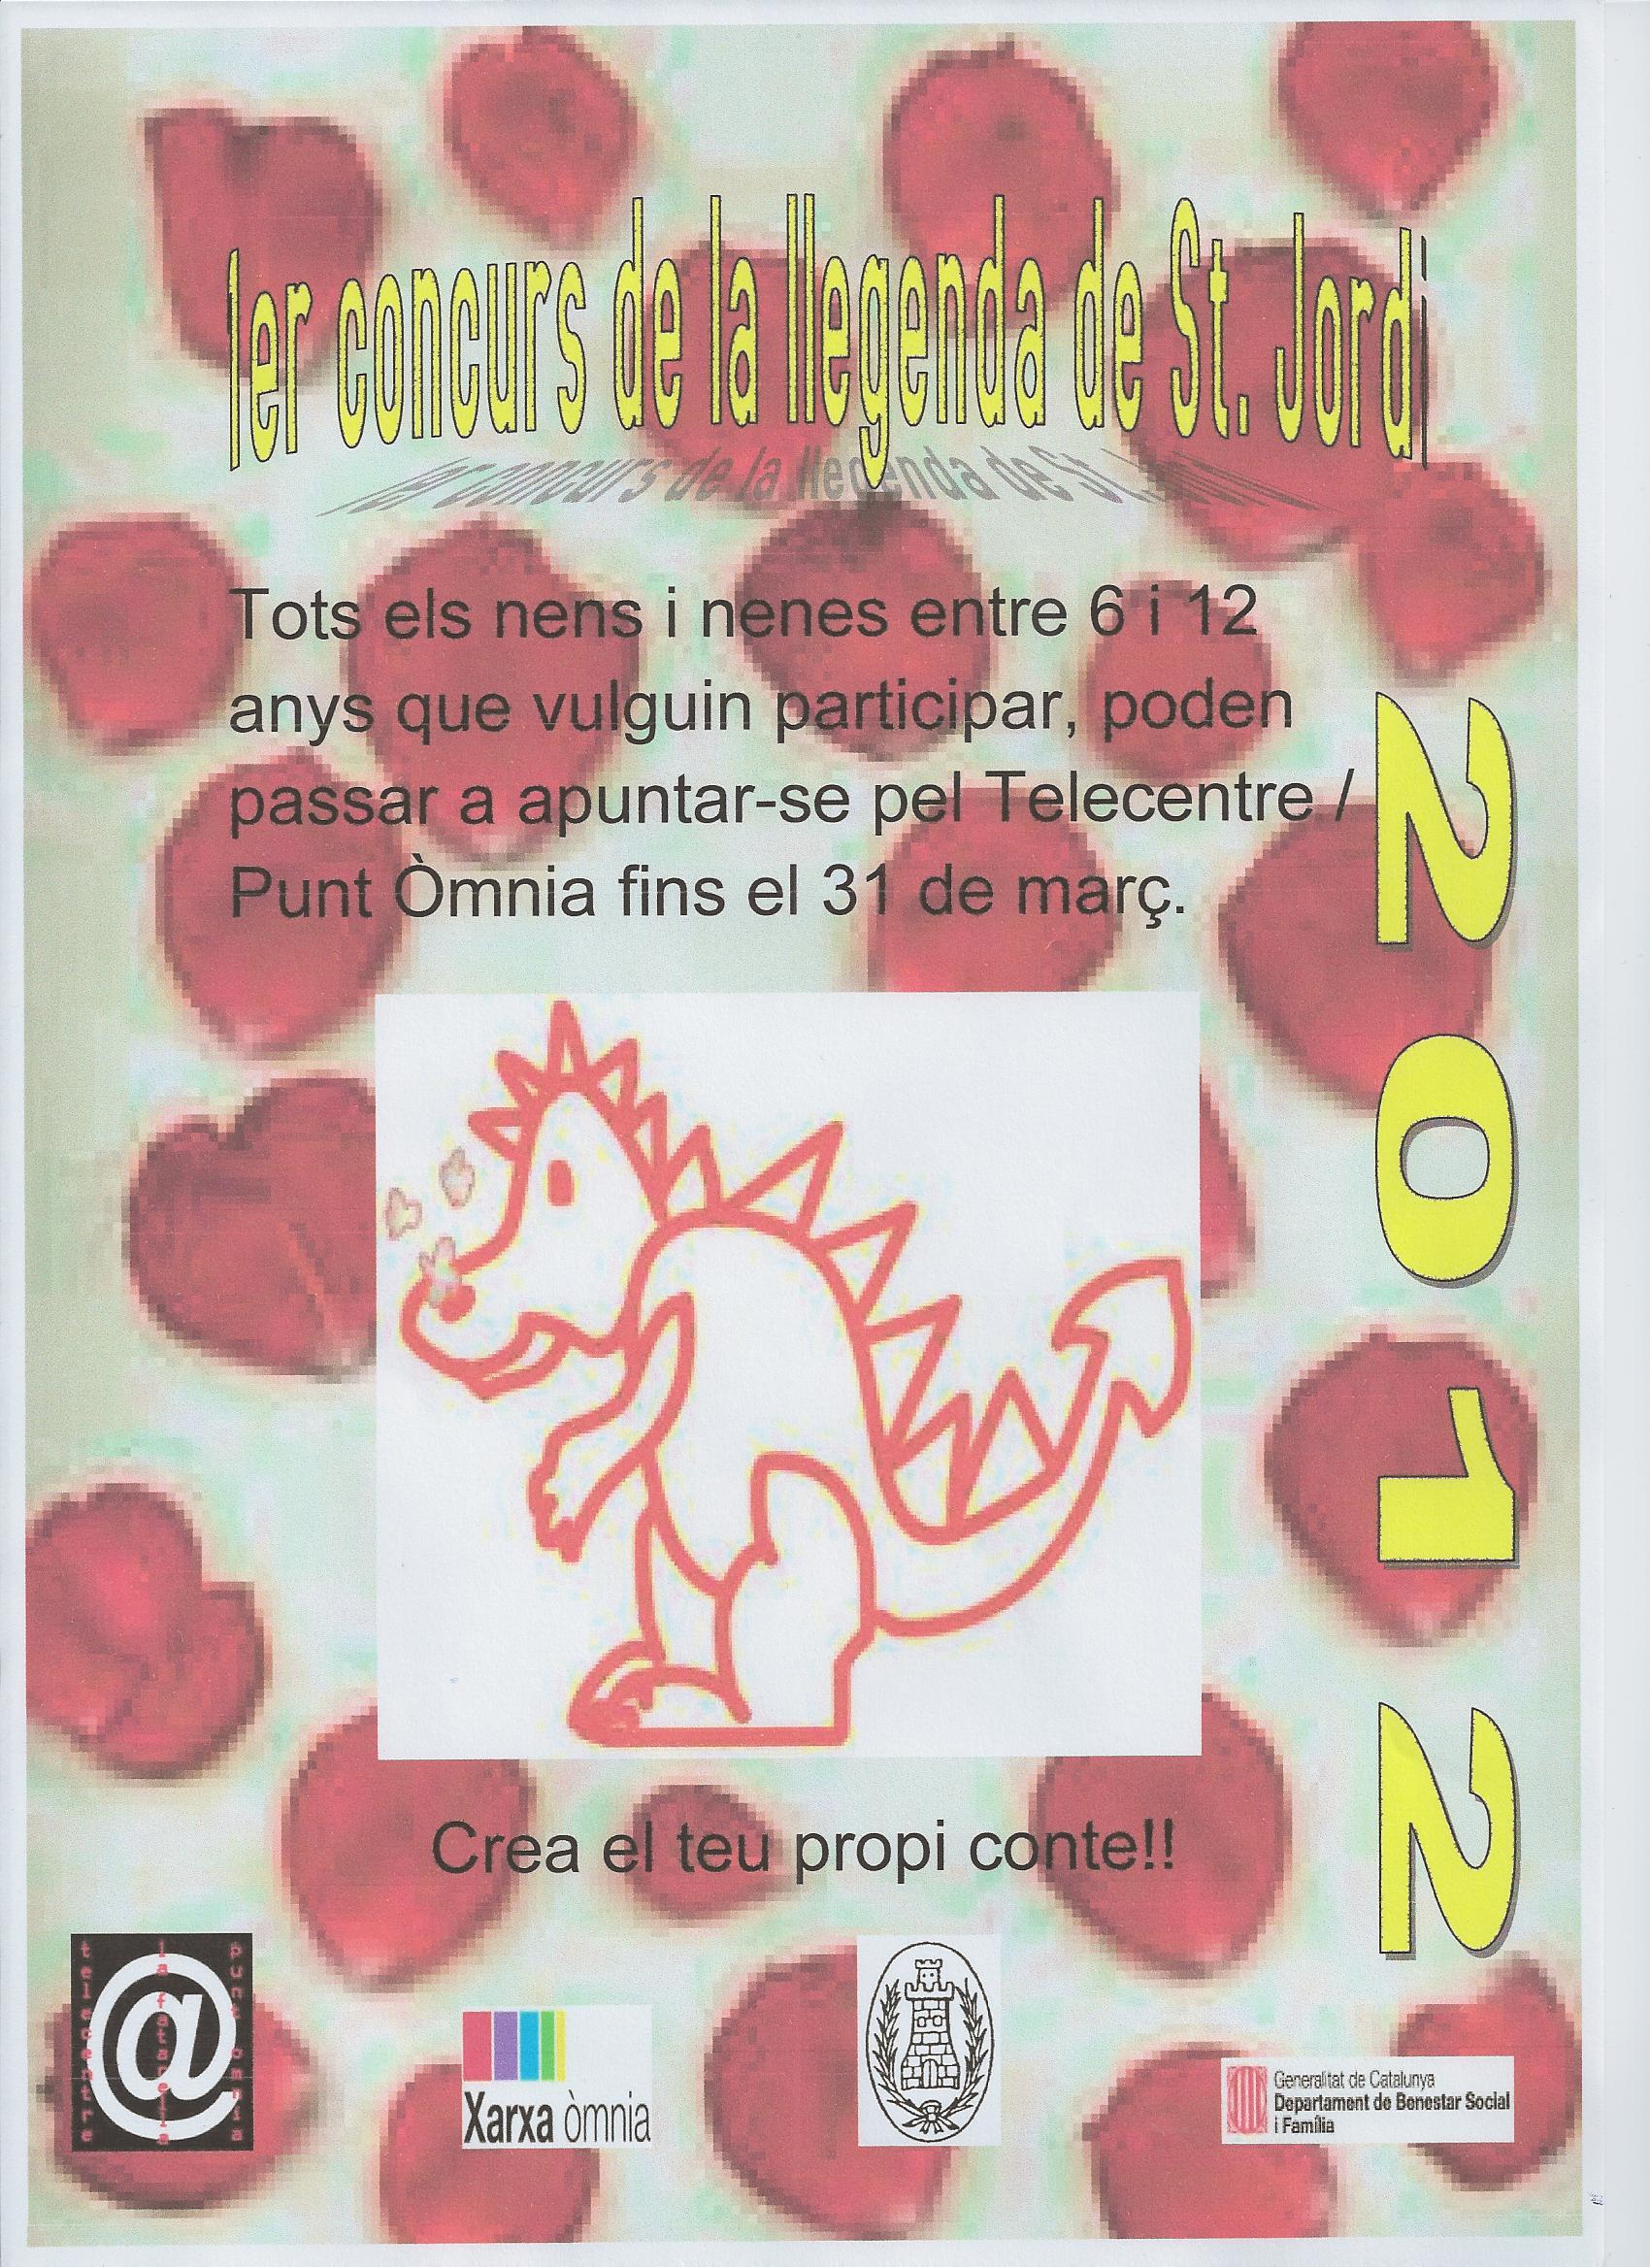 1r concurs de la llegenda de St. Jordi